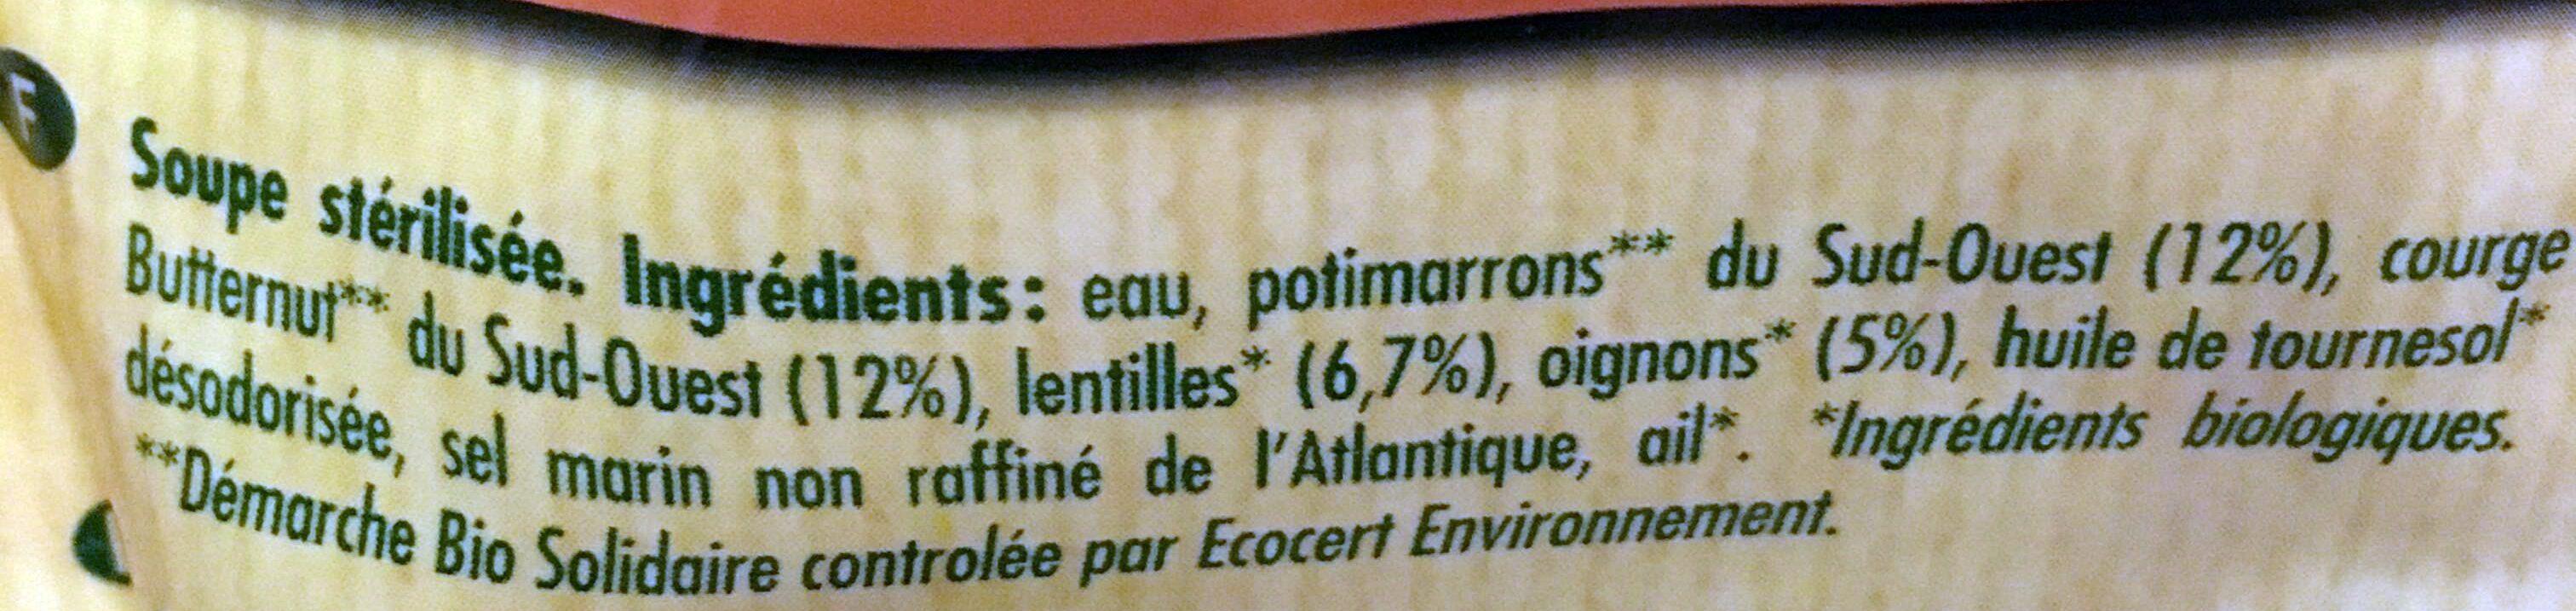 Soupe potimarron & courge butternut - Ingrediënten - fr